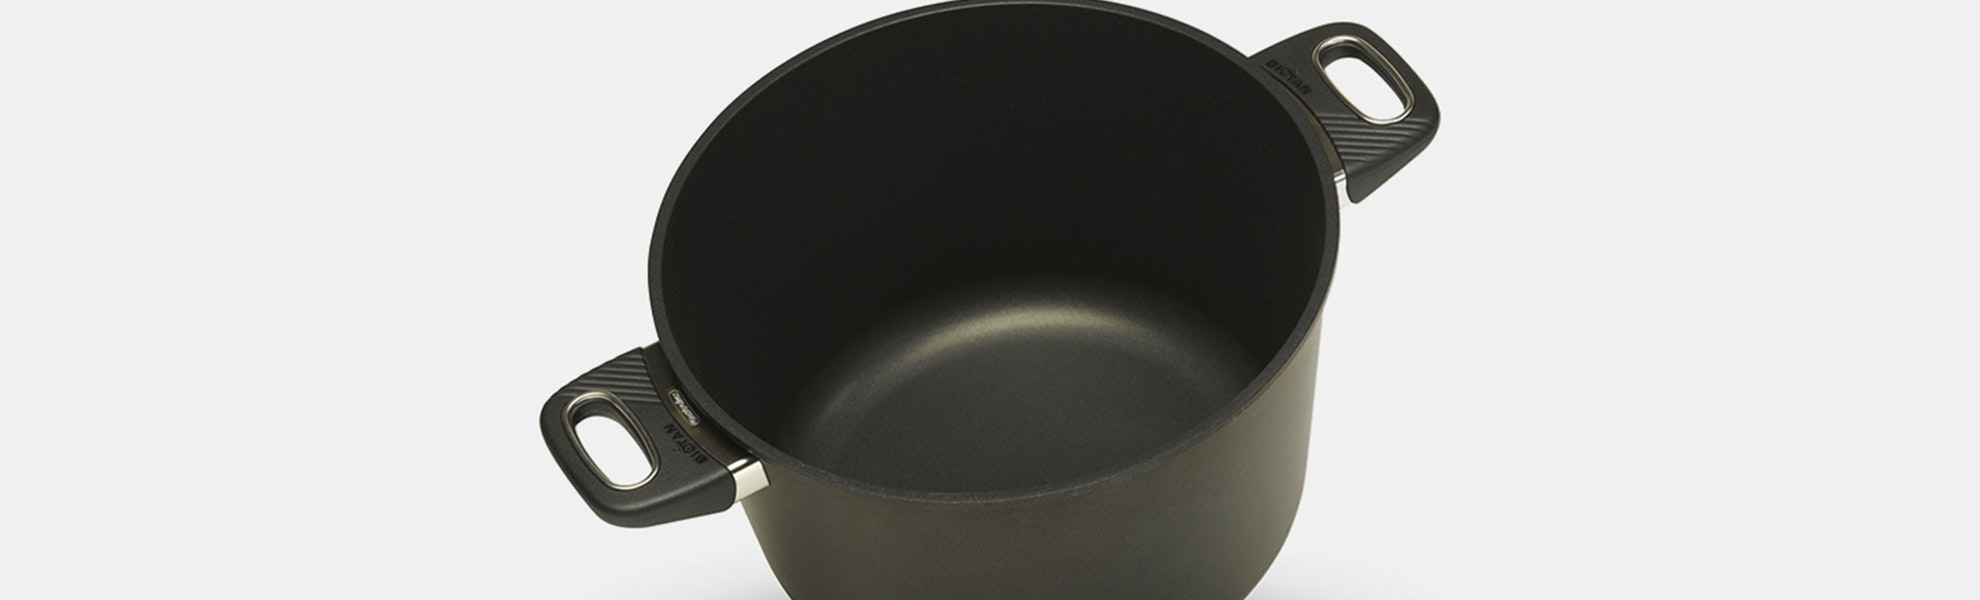 Gastrolux Stock Pot